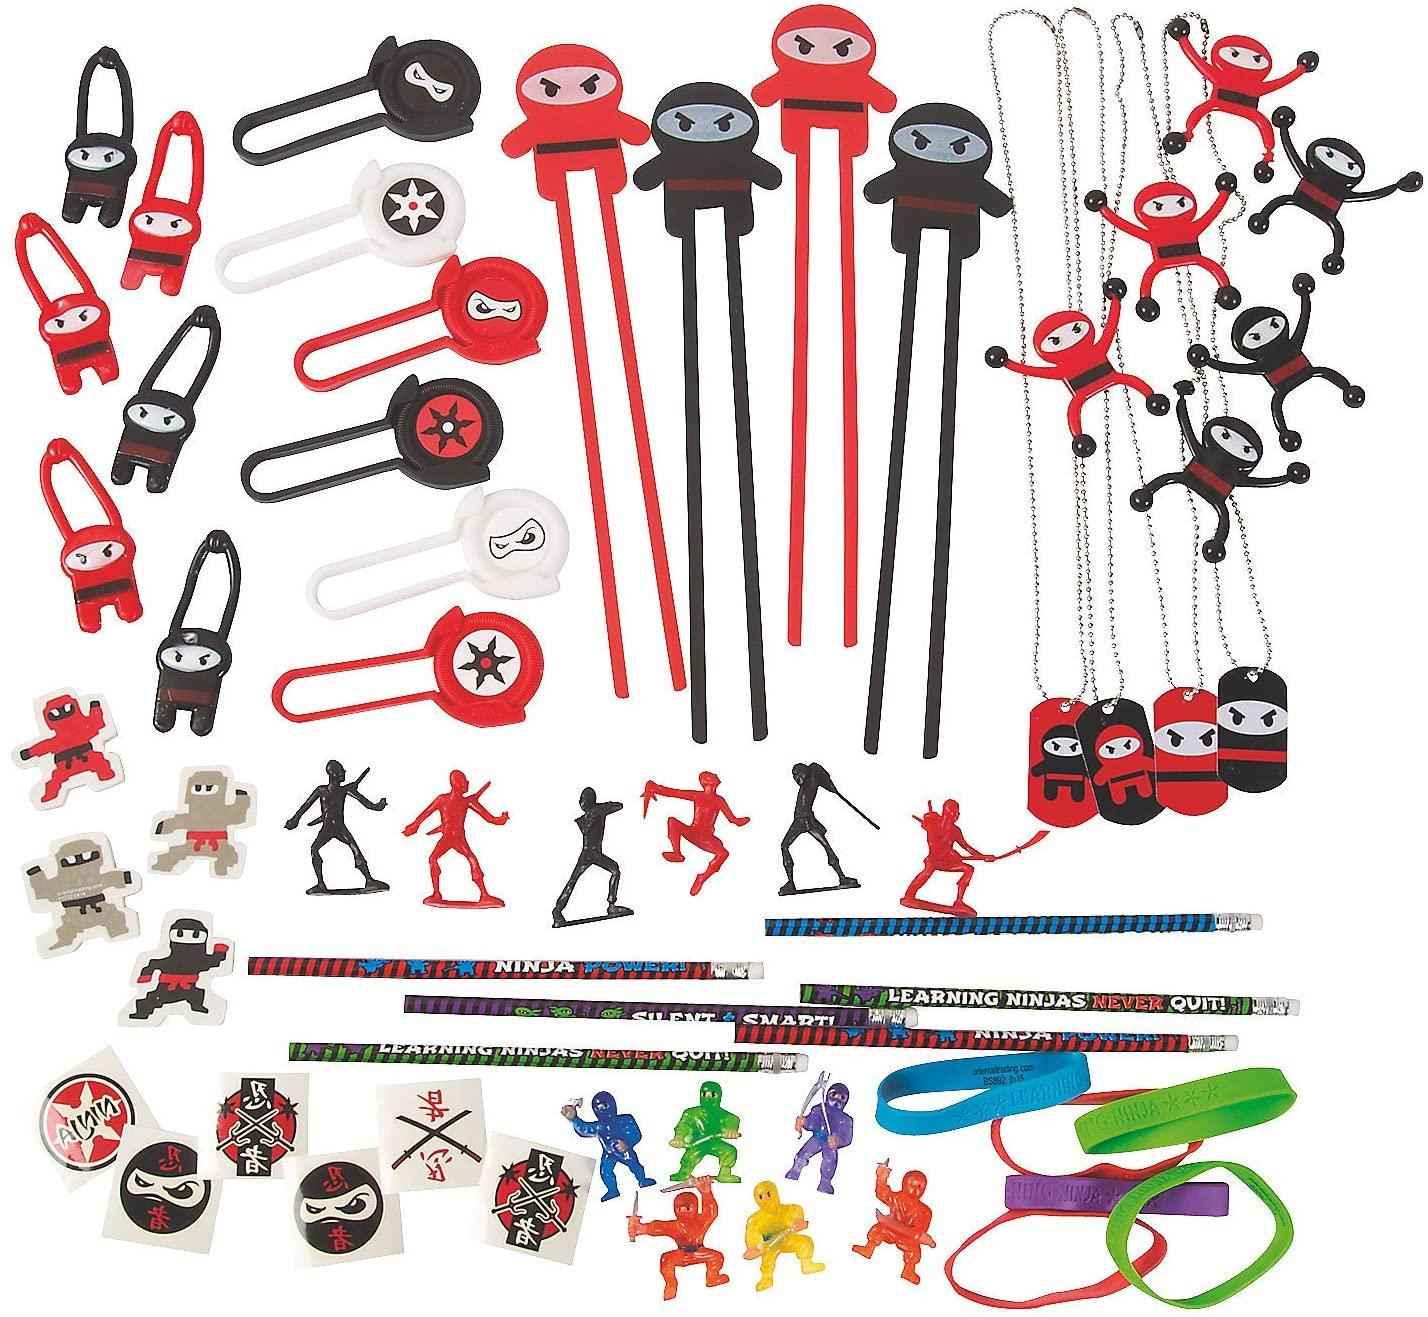 Fun Express - Ninja Assortment (50pc) - Toys - Assortments - 50Pc Assortments - 50 Pieces